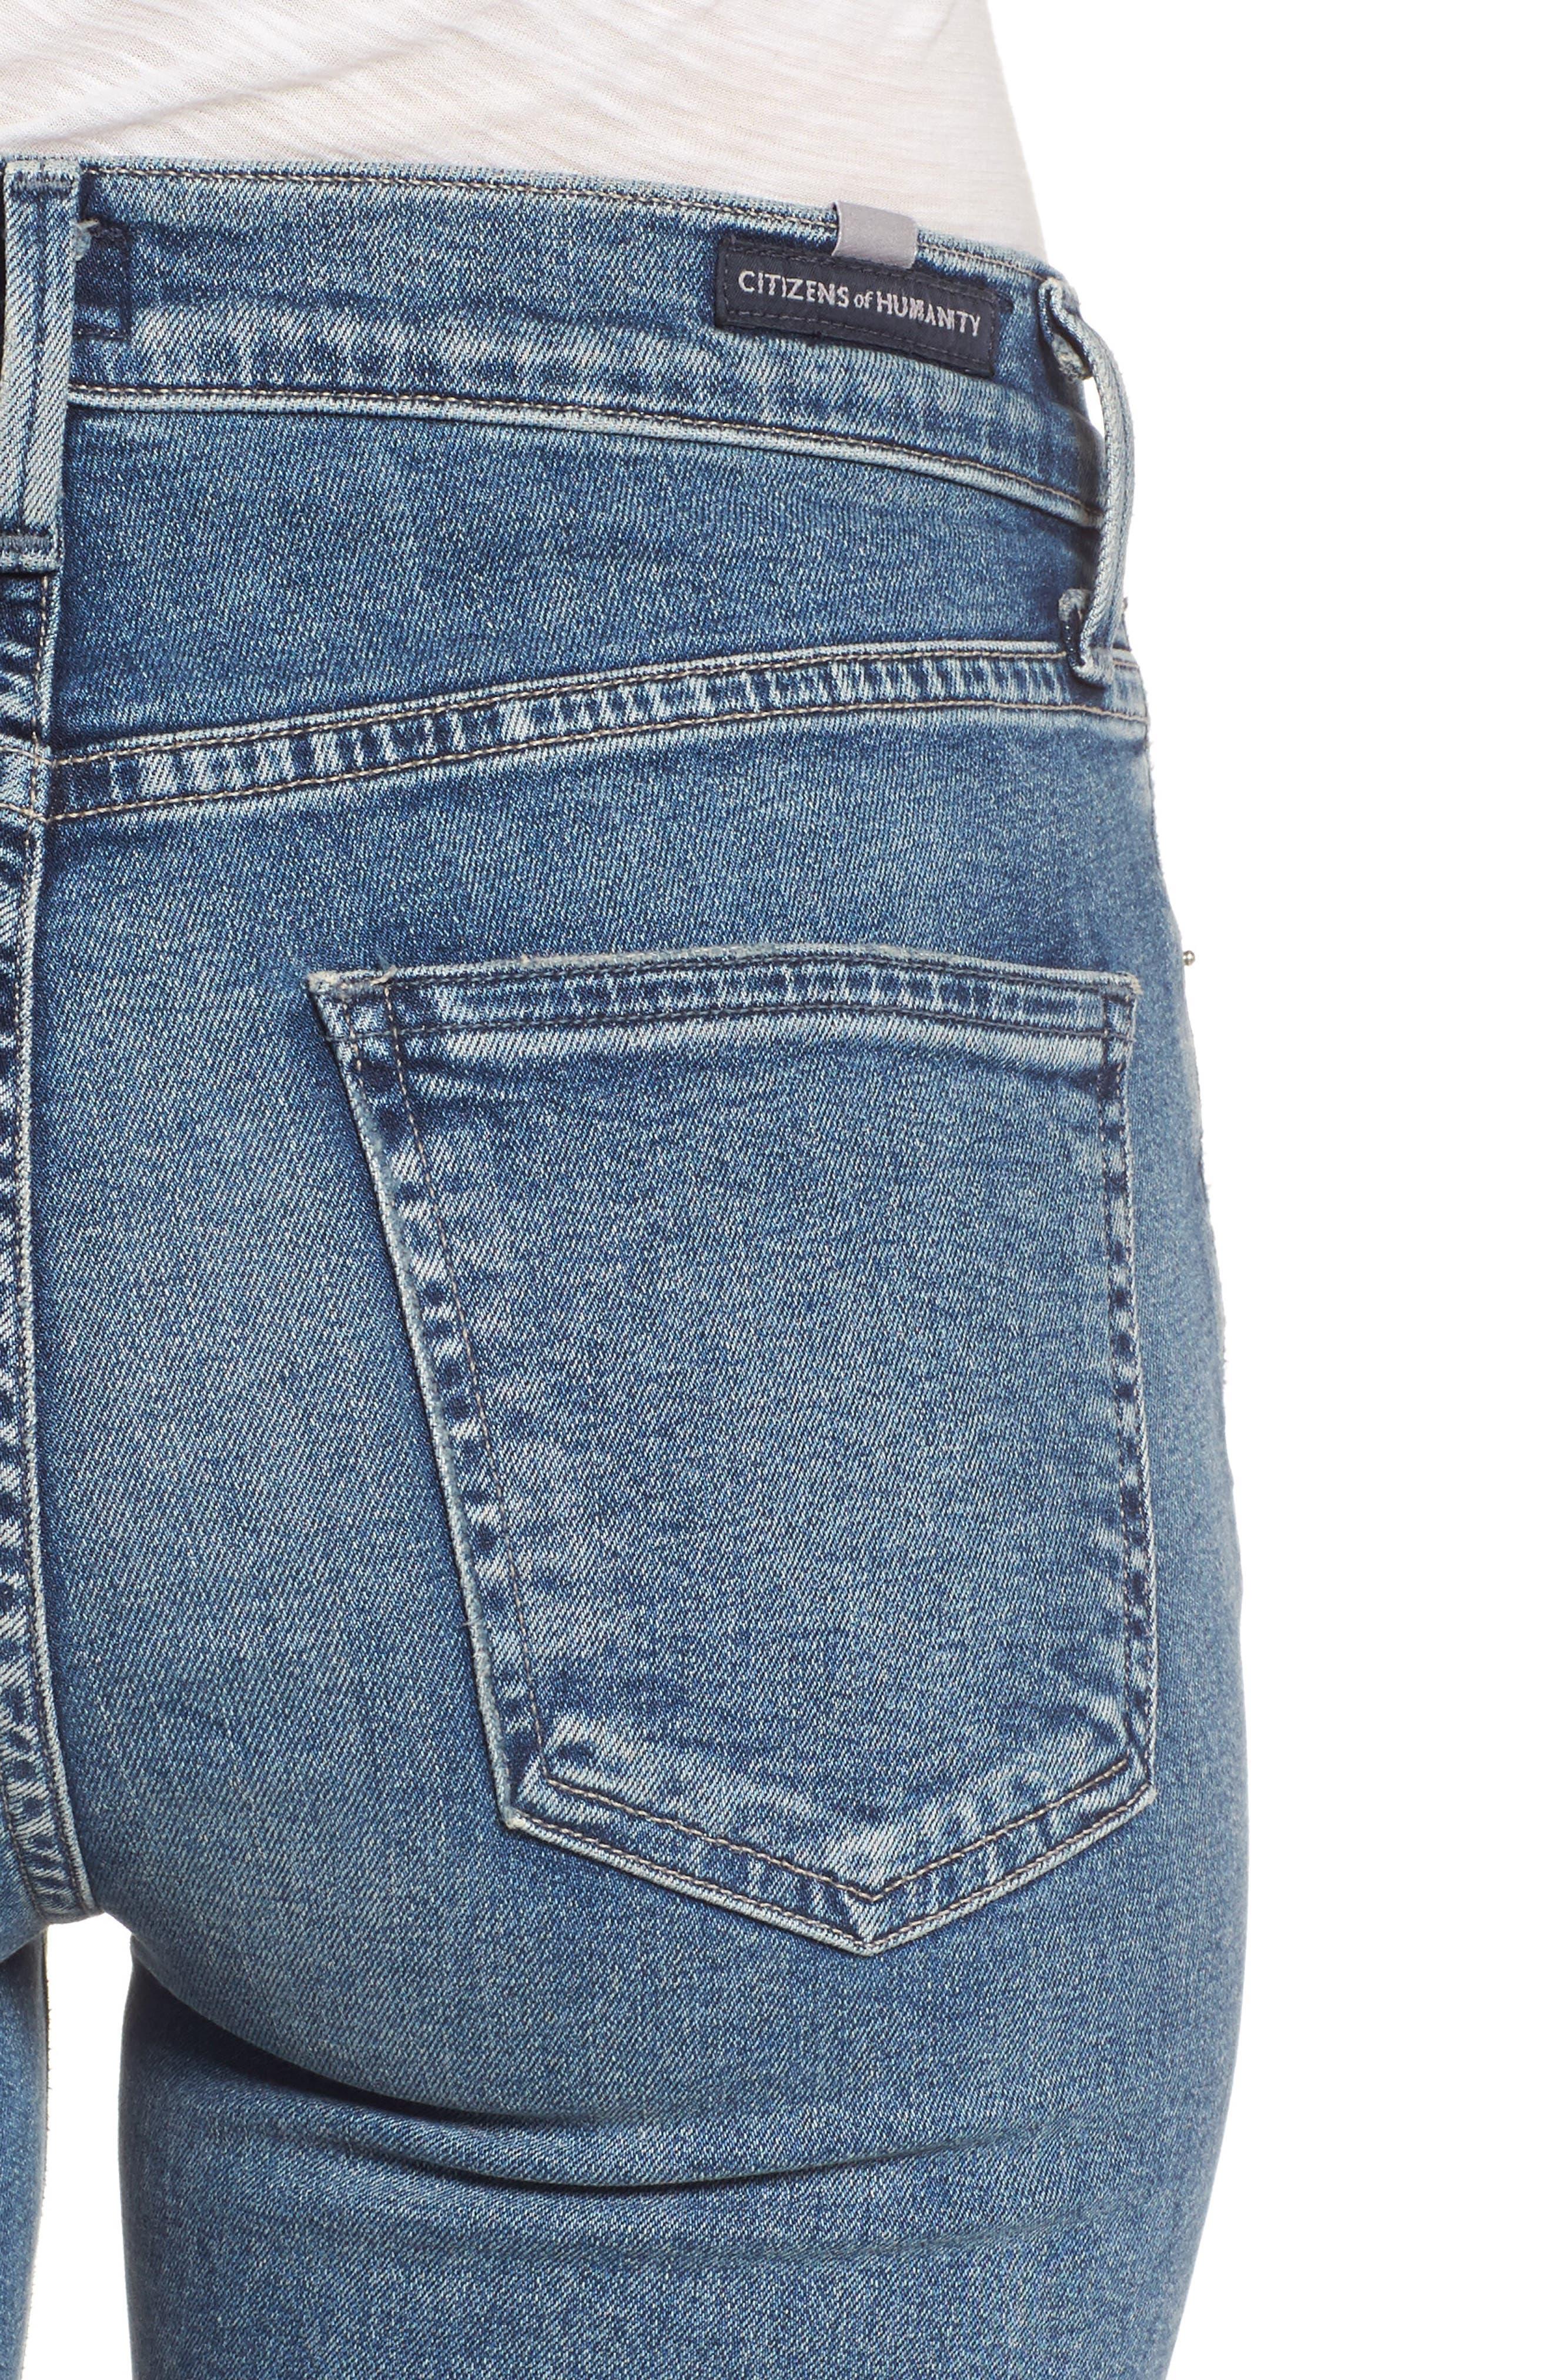 Rocket Crop Skinny Jeans,                             Alternate thumbnail 4, color,